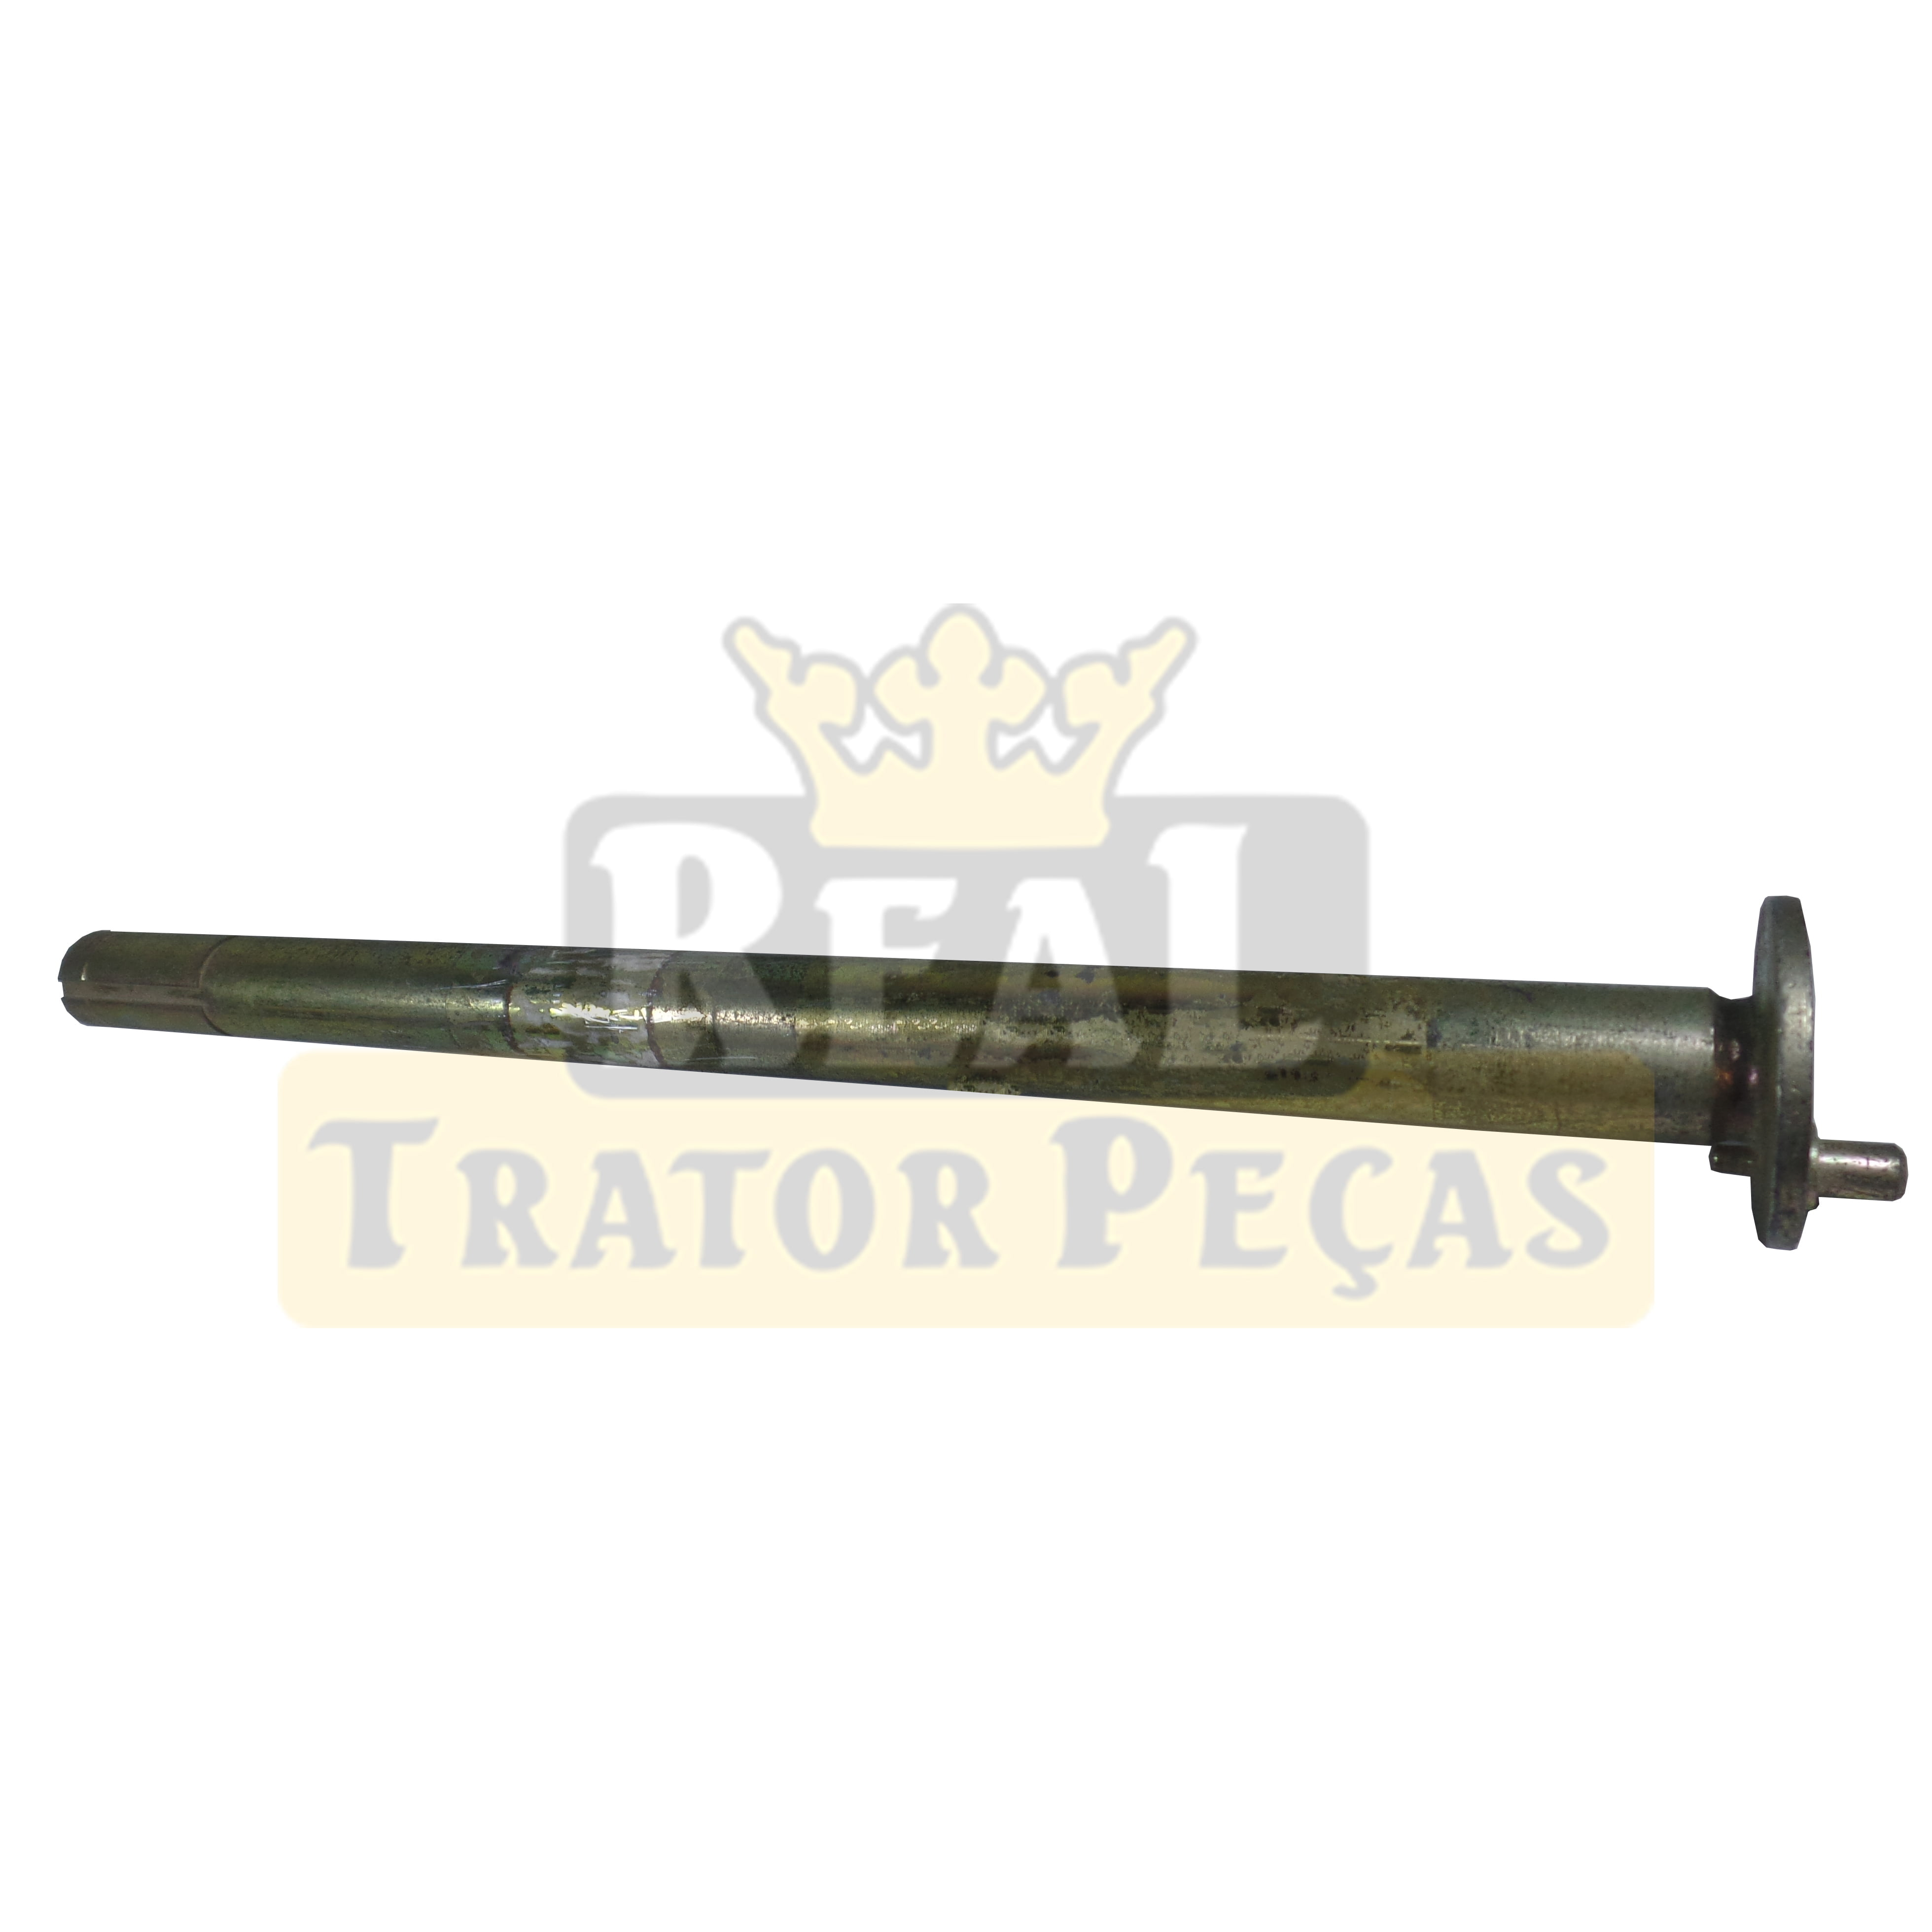 TUBO EIXO CONTROLE - MASSEY FERGUSON 265 / 275 / 290 / 292 /  296 / 299